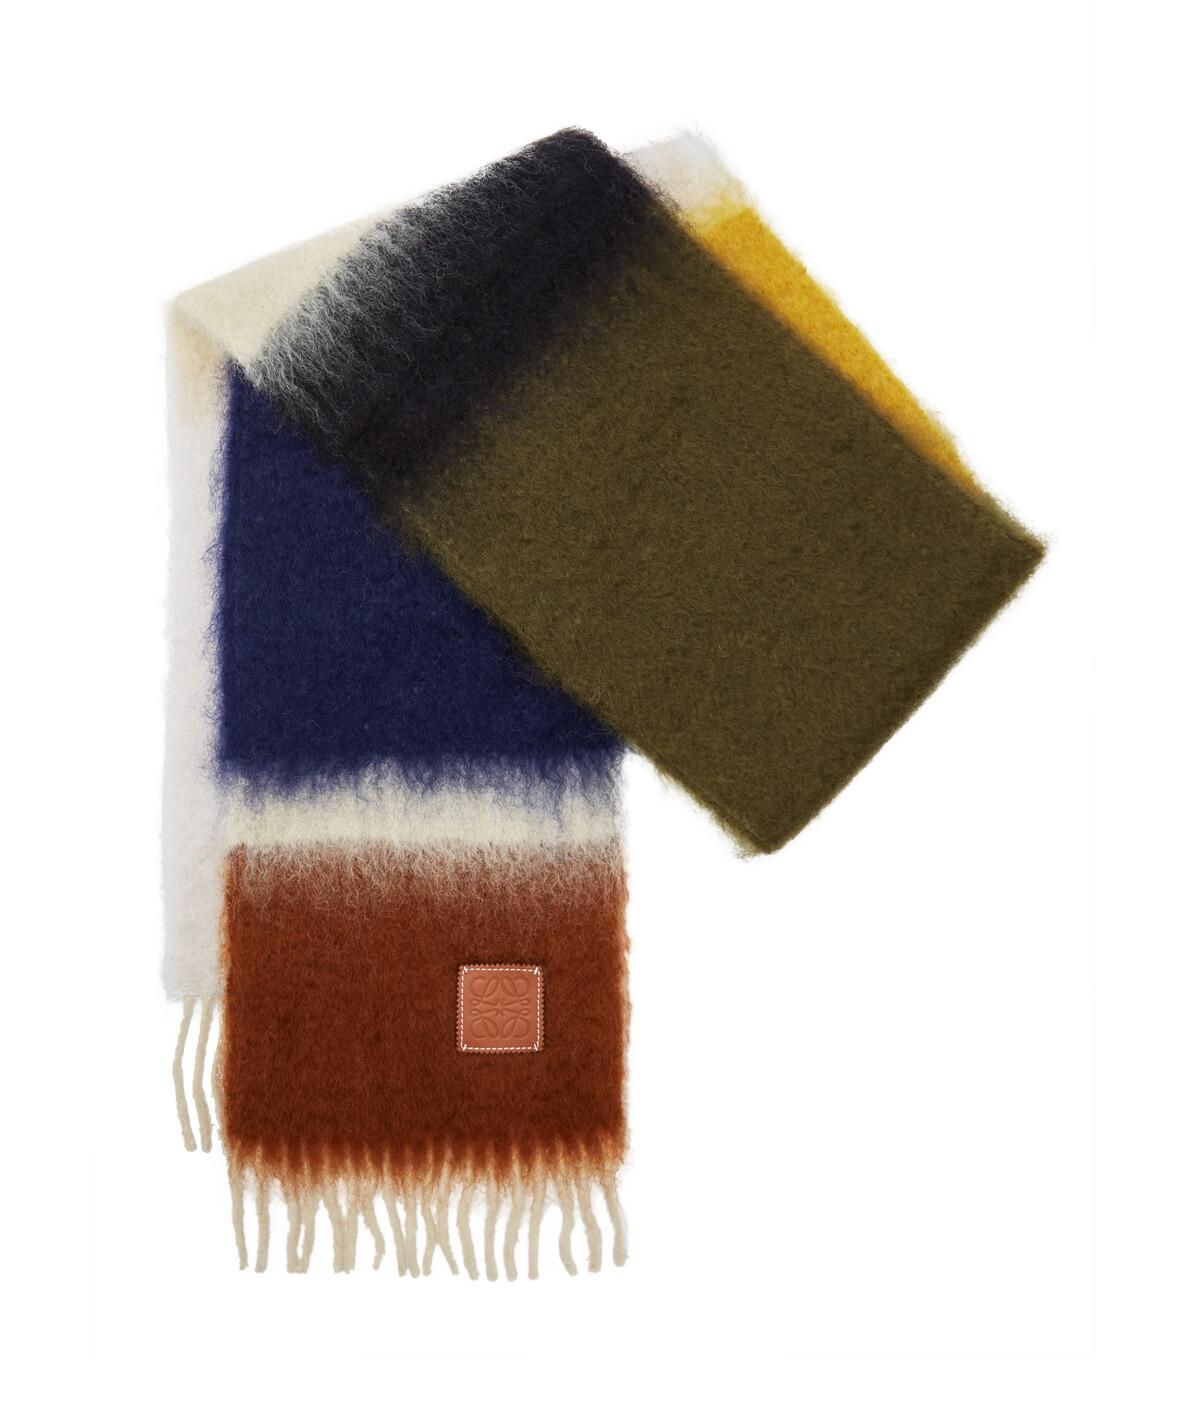 LOEWE 23X185 Scarf Stripes Verde Kaki/Blanco front